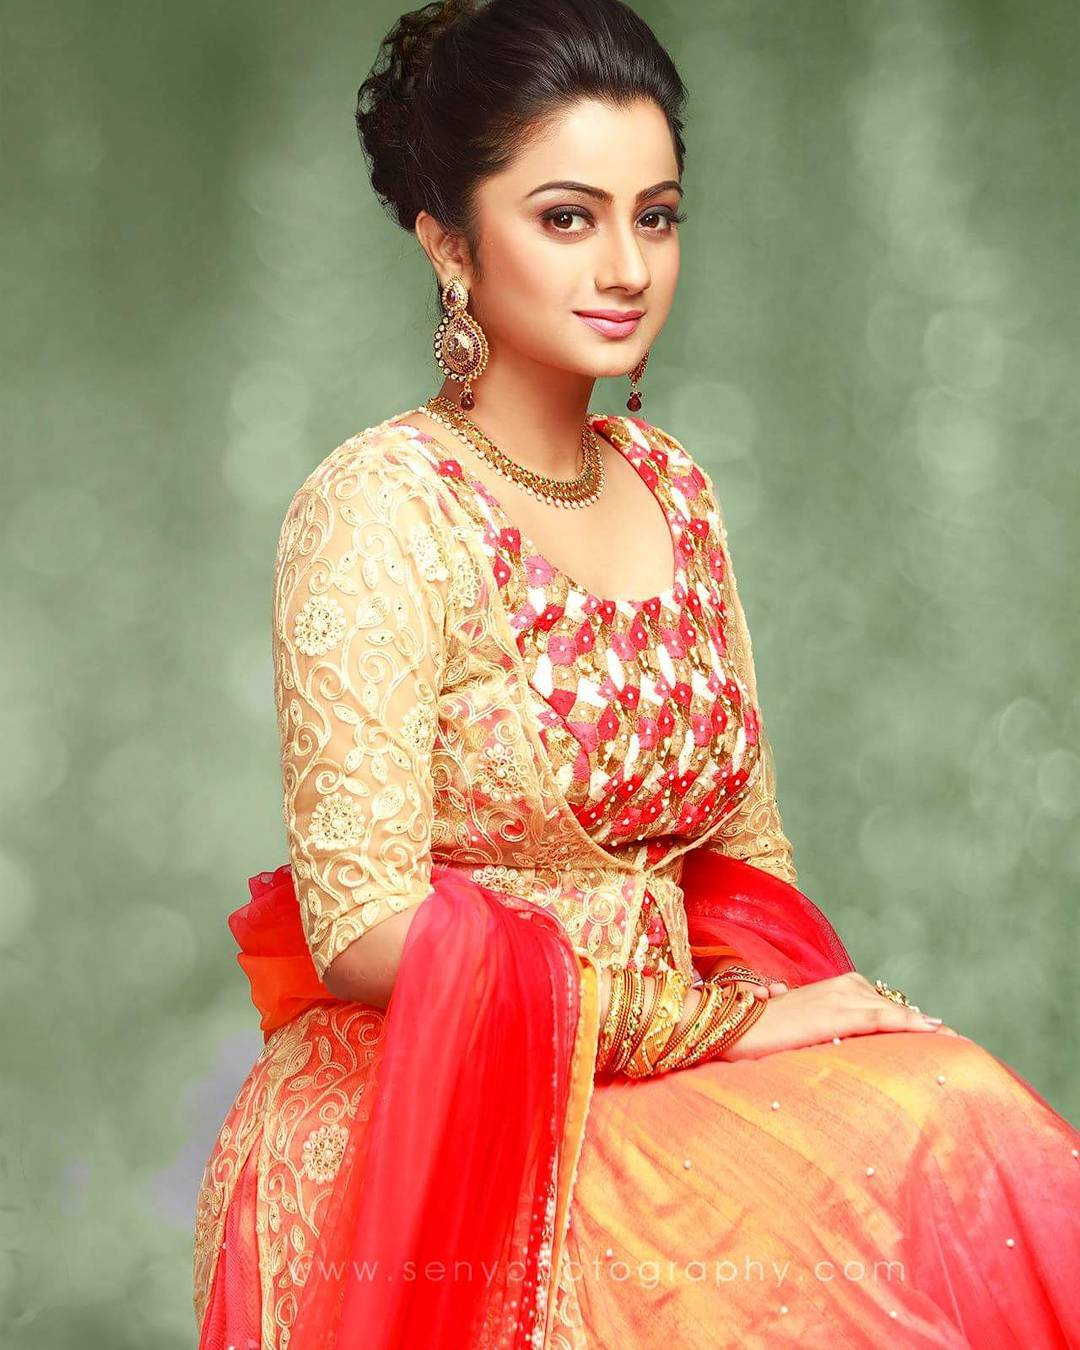 Namitha Pramod Hd Imagesphotoswallpapers - Actress World-5228